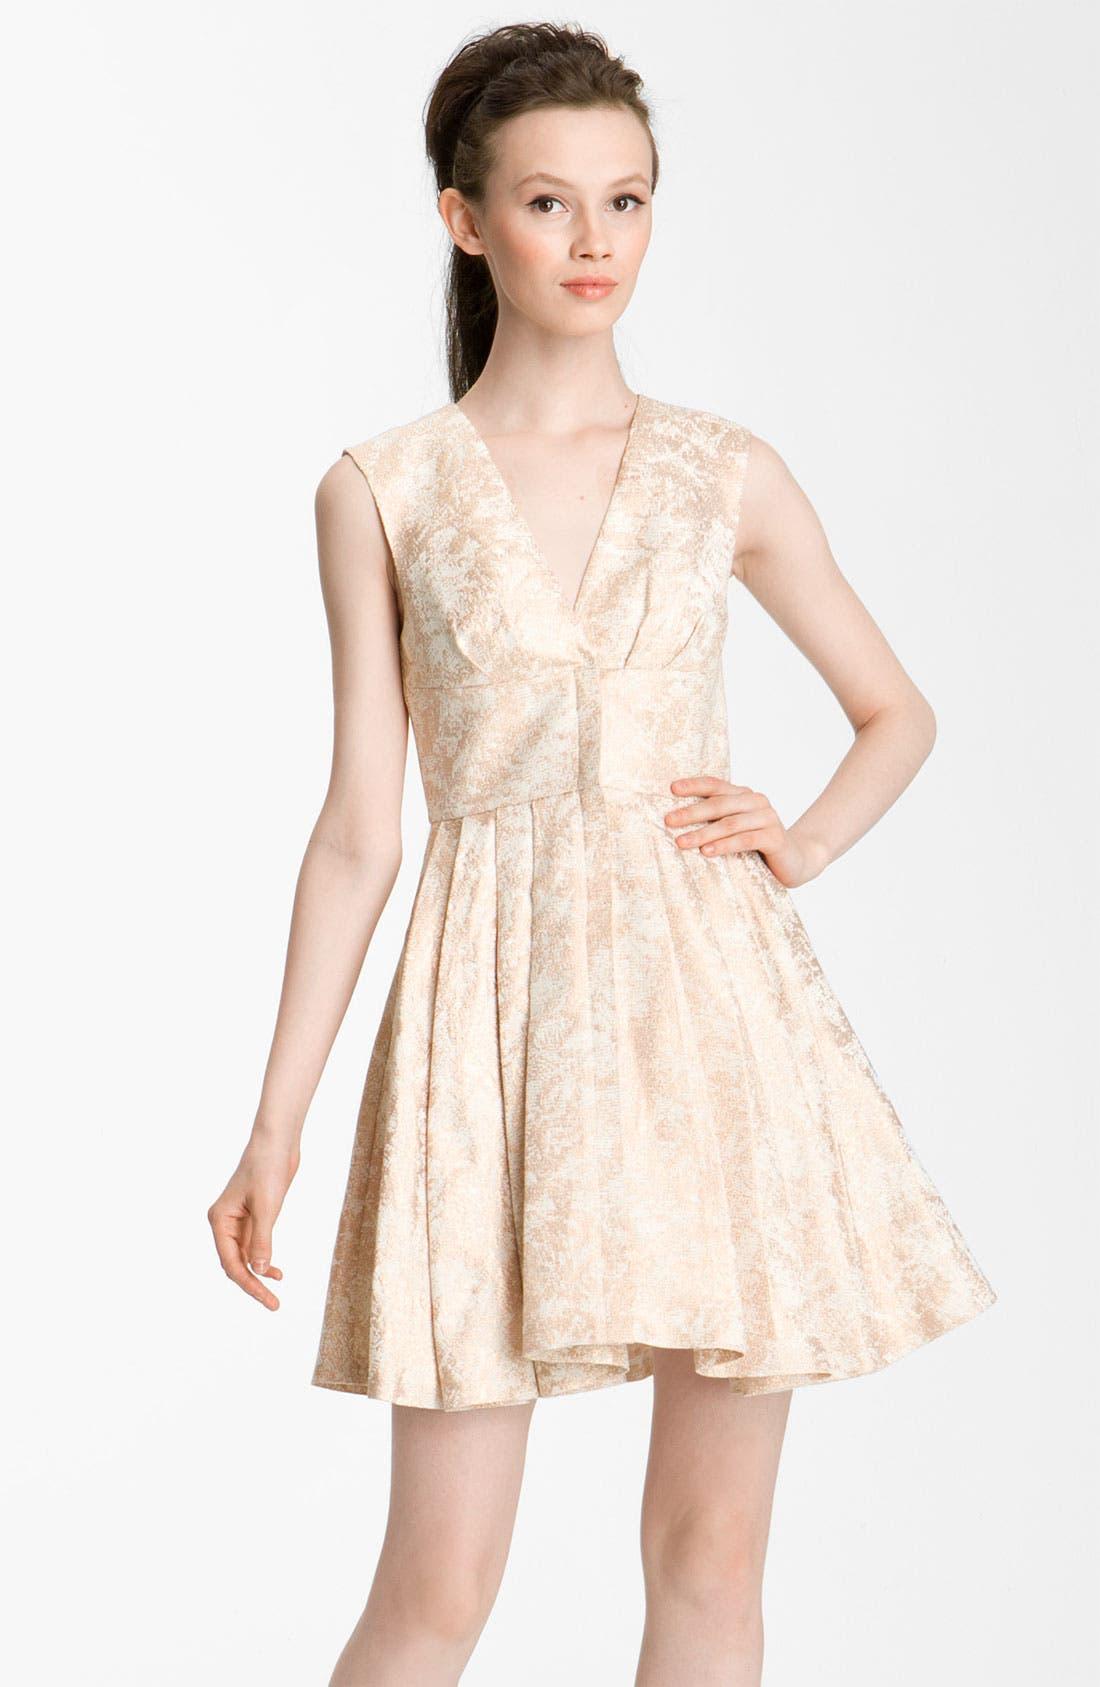 Alternate Image 1 Selected - Rachel Zoe 'Daria' Metallic Brocade Dress